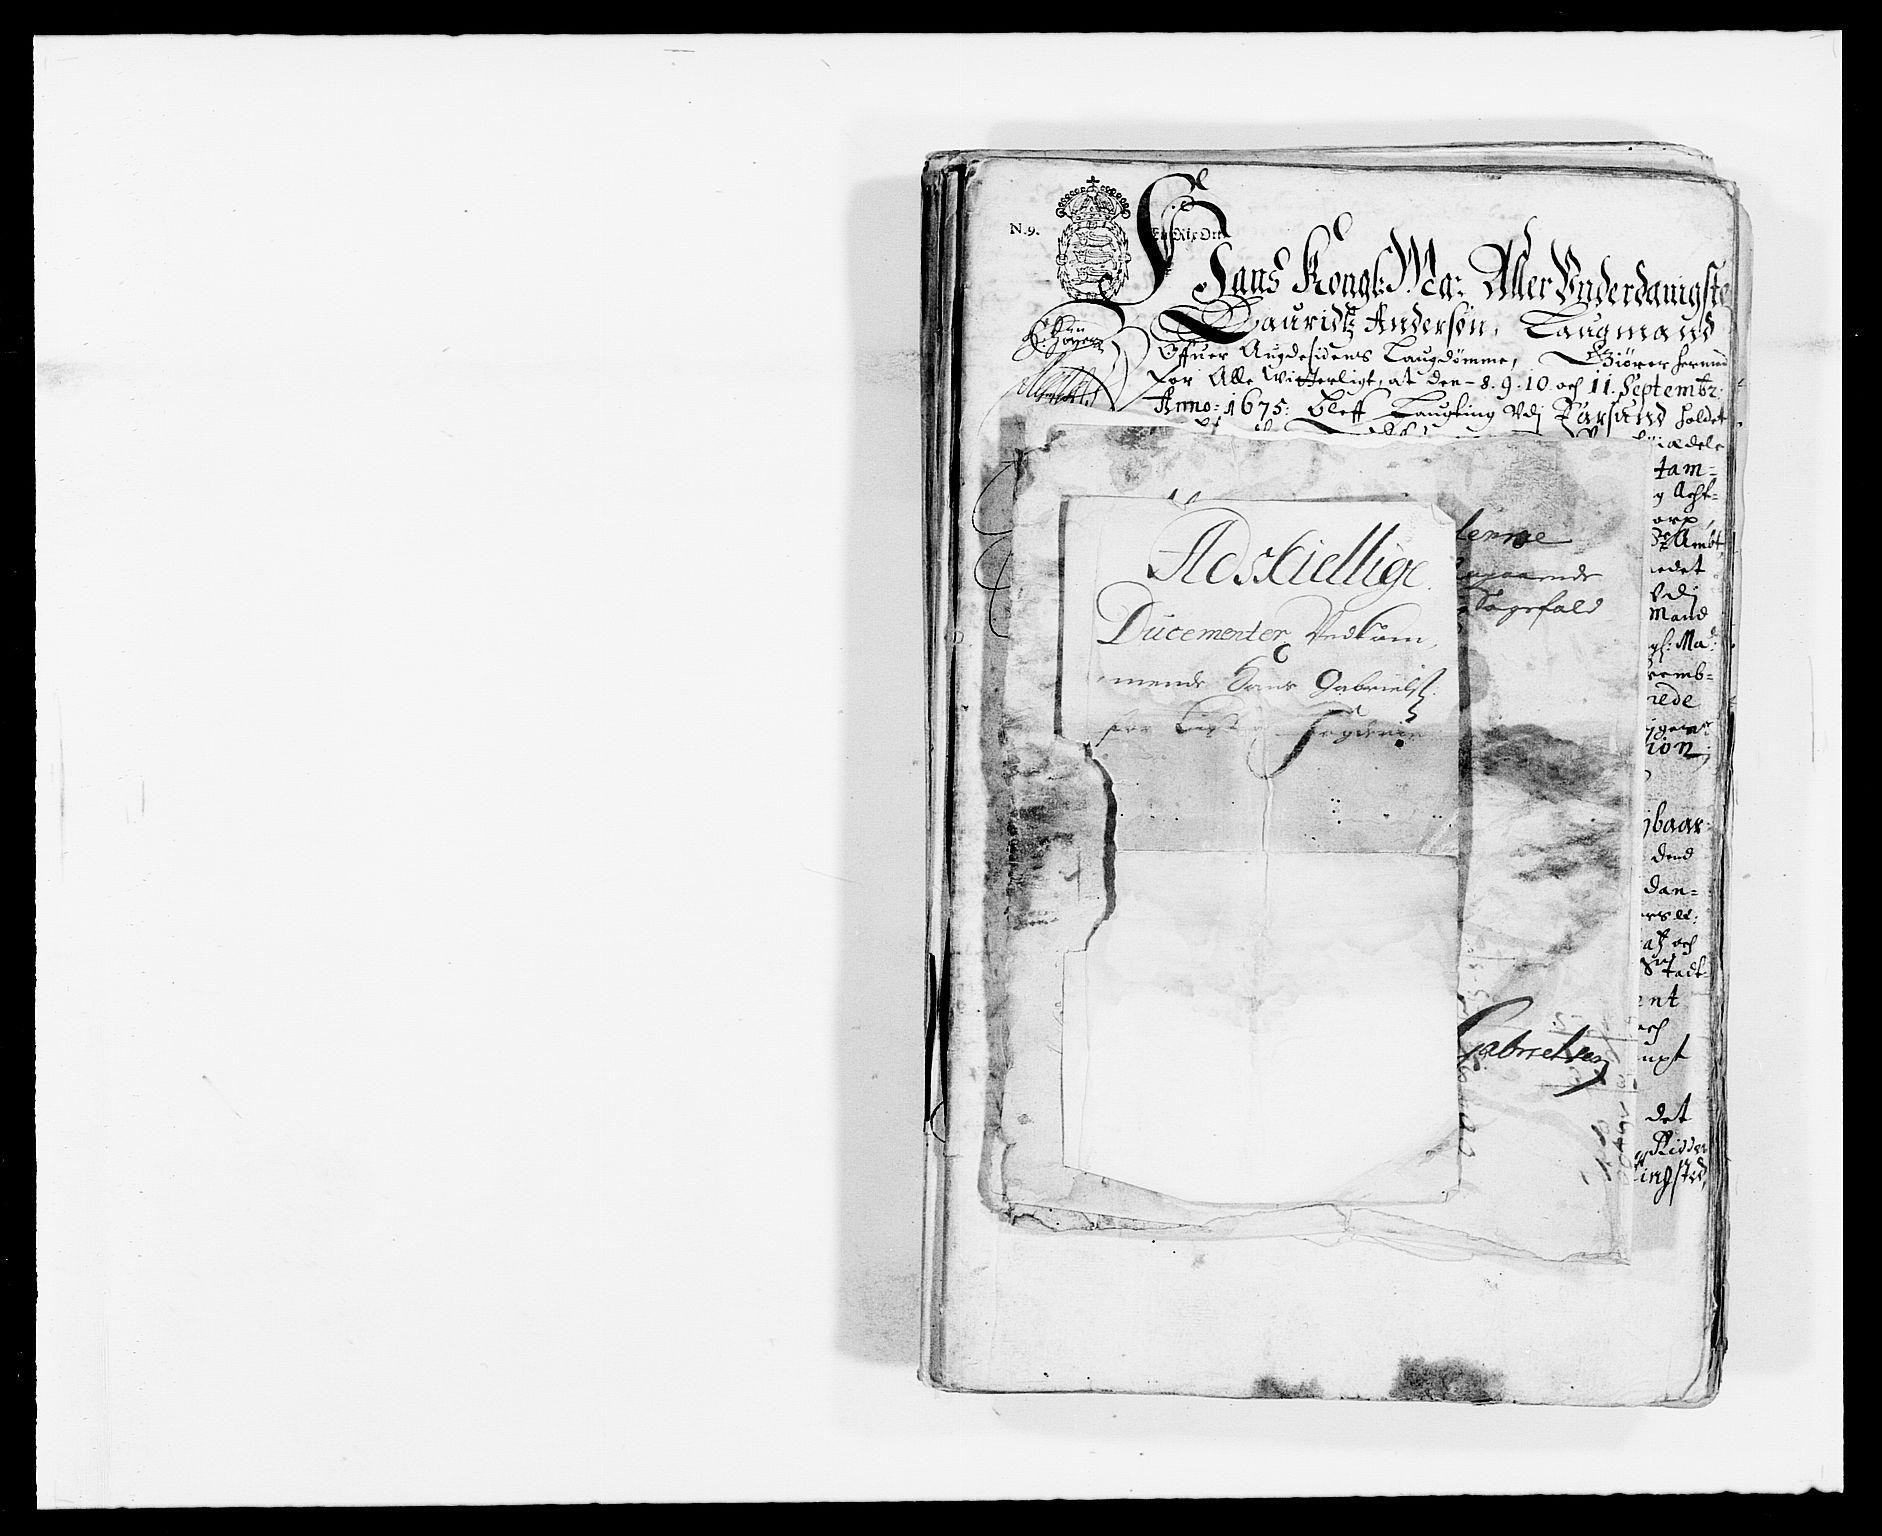 RA, Rentekammeret inntil 1814, Reviderte regnskaper, Fogderegnskap, R41/L2527: Fogderegnskap Lista, 1672, s. 1